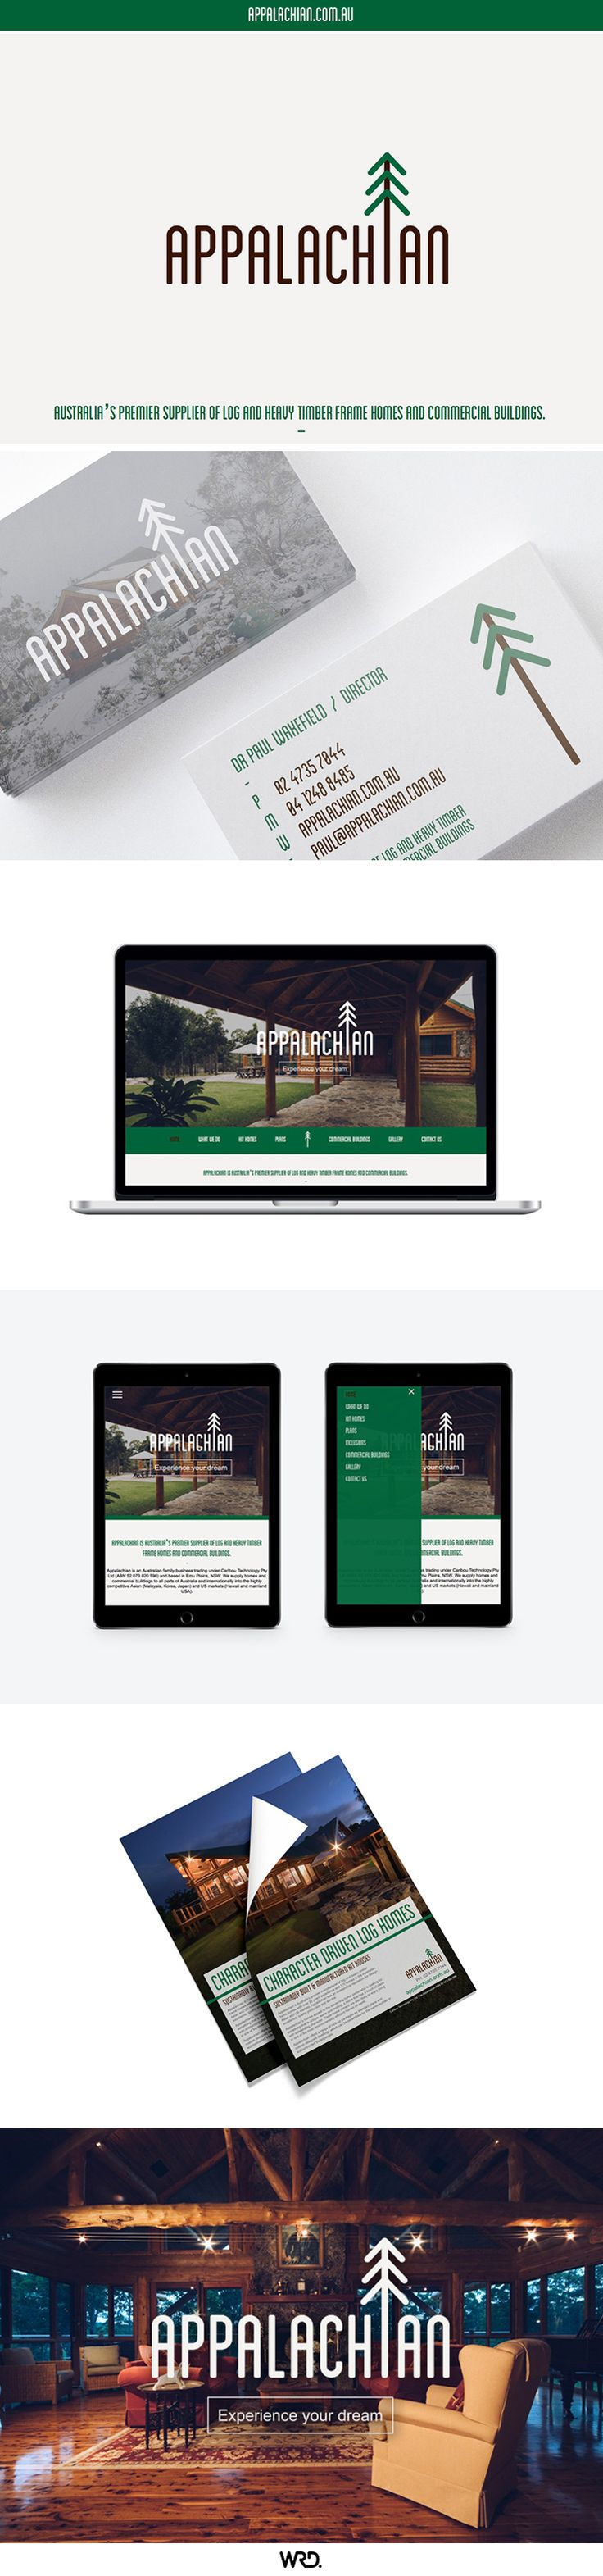 Appalachian - Australia's premier supplier of log homes. Branding by WRD.